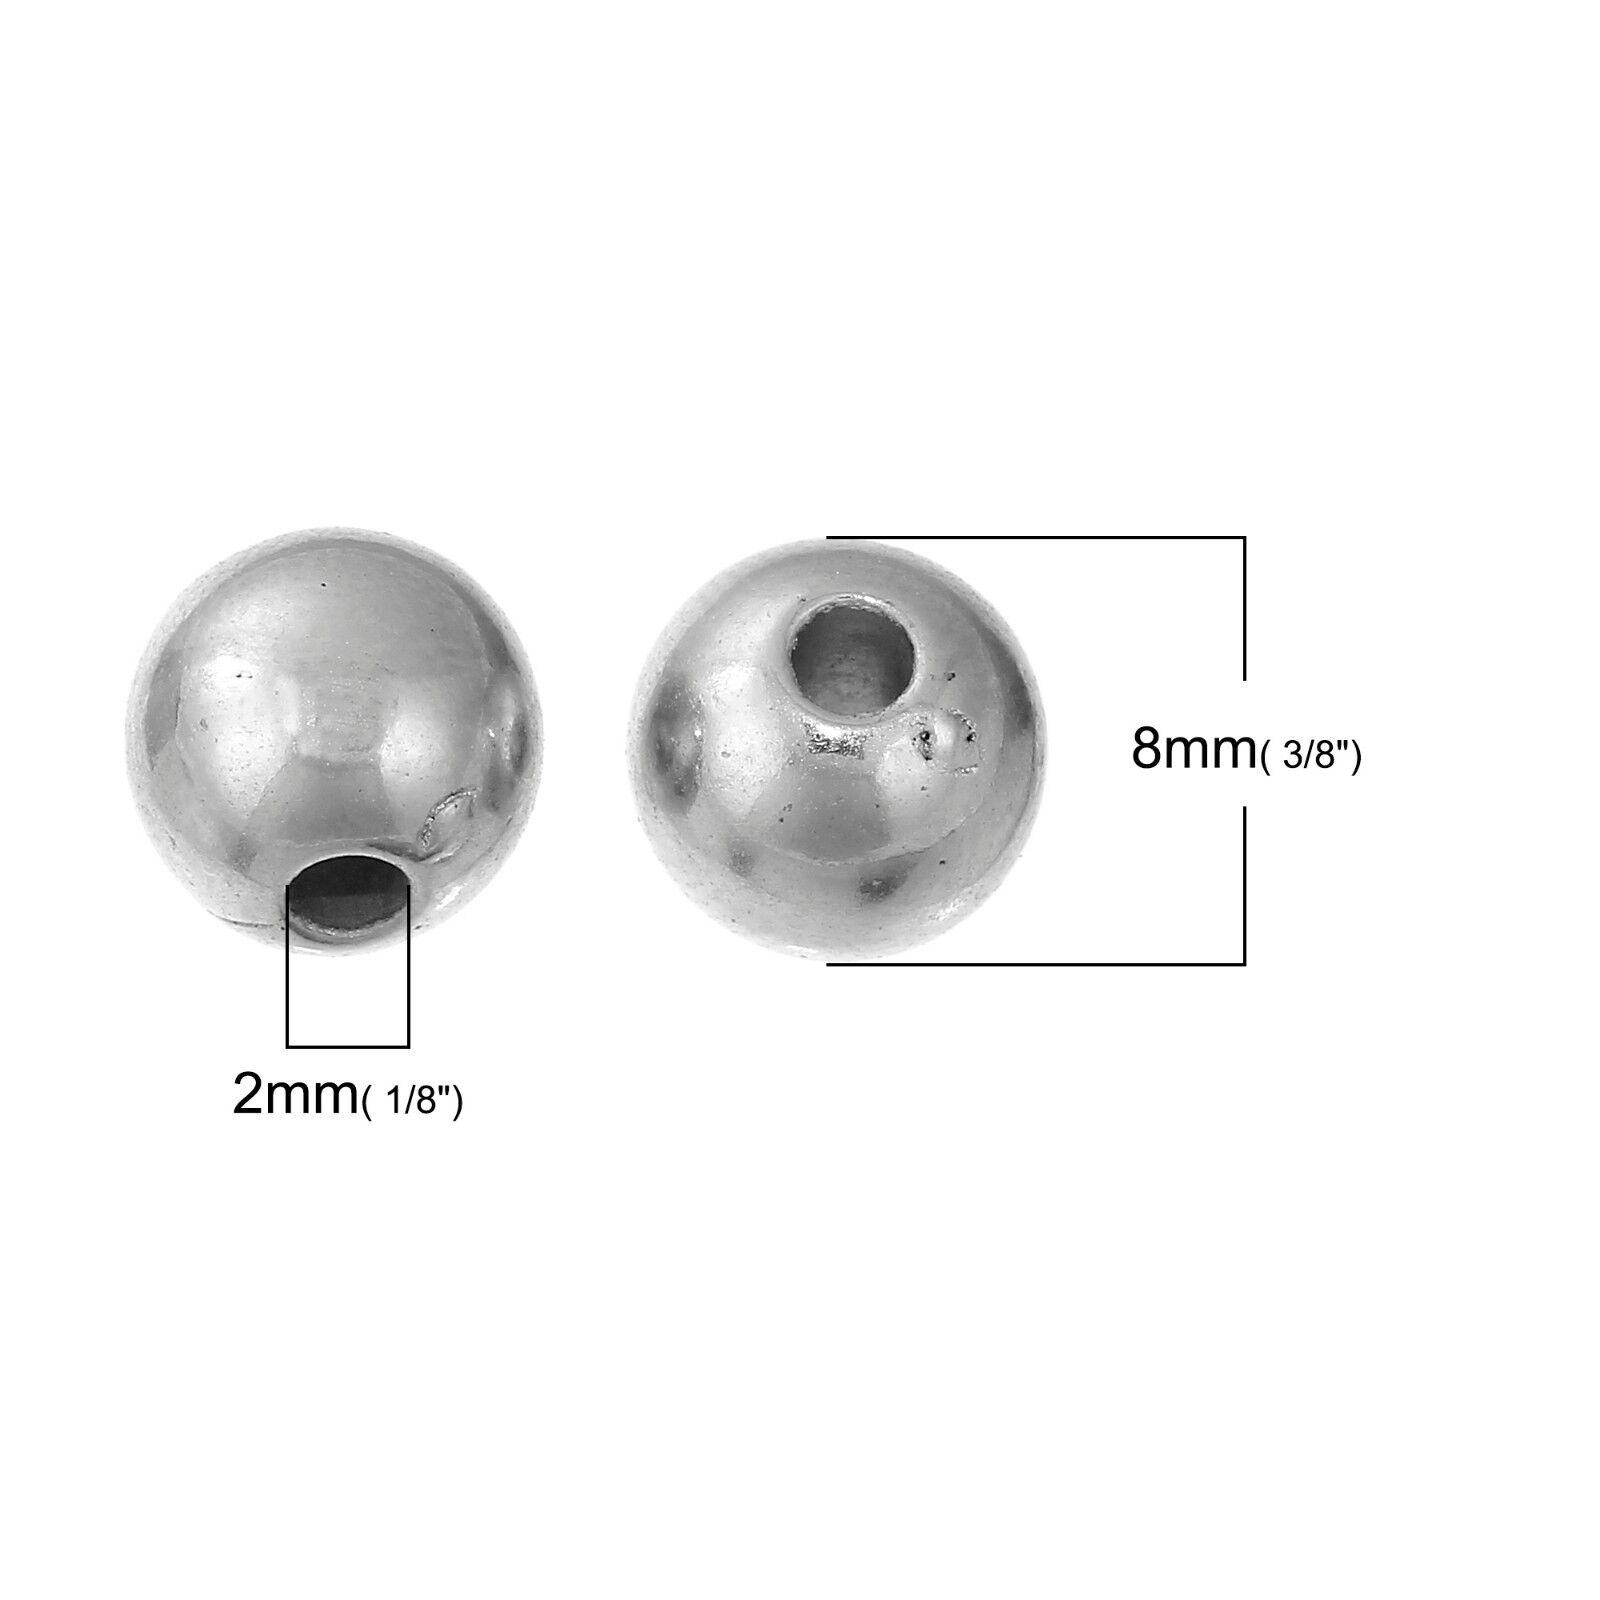 100 Silver Acrylic 8mm Spacer Beads Metallic Jewellery Making J22842W